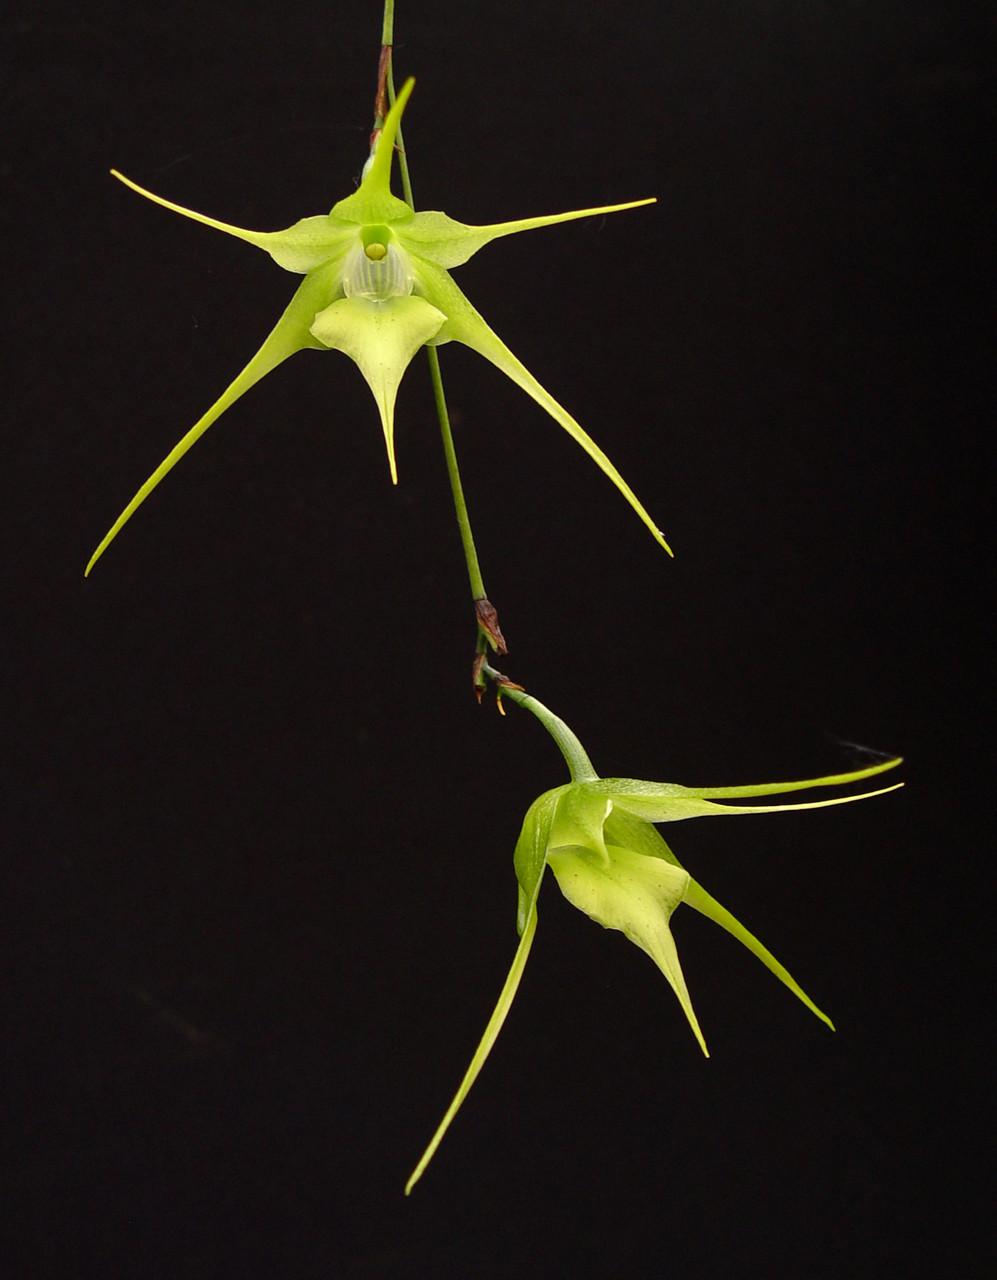 Aeranthes caudata 'Green Dragon' x self